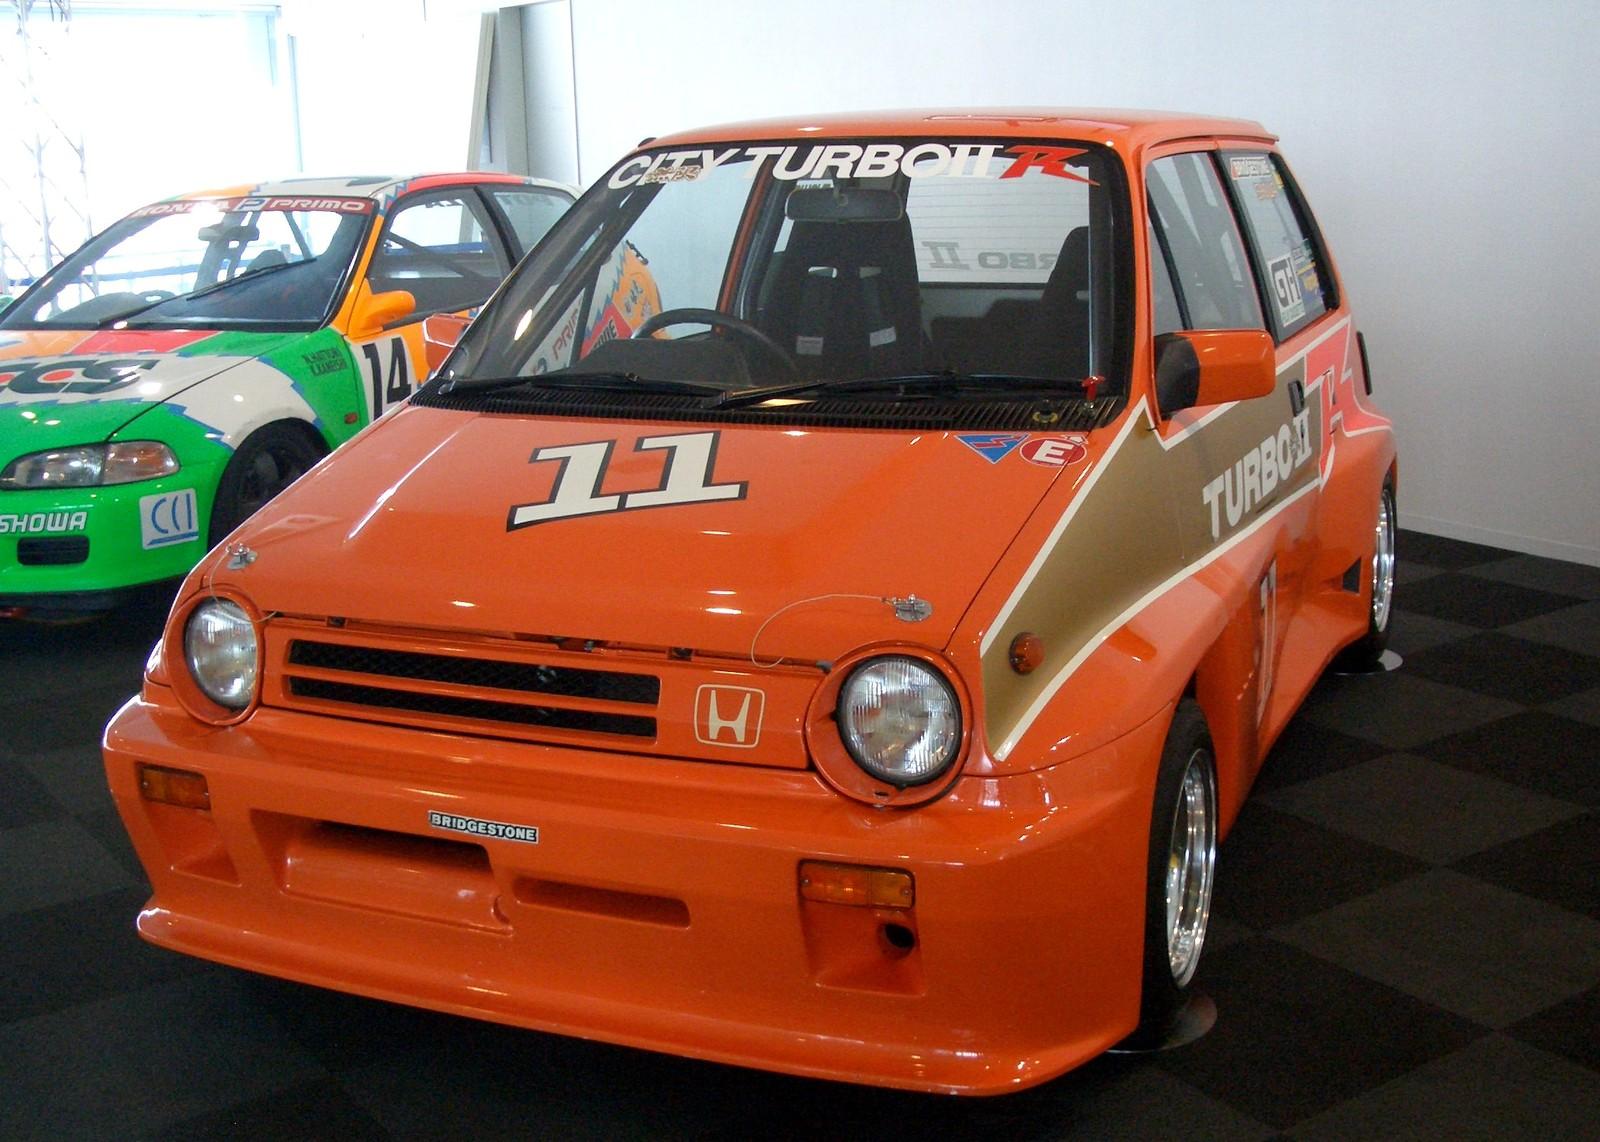 Honda City Bulldog, wyścigi, sport, japoński mały samochód